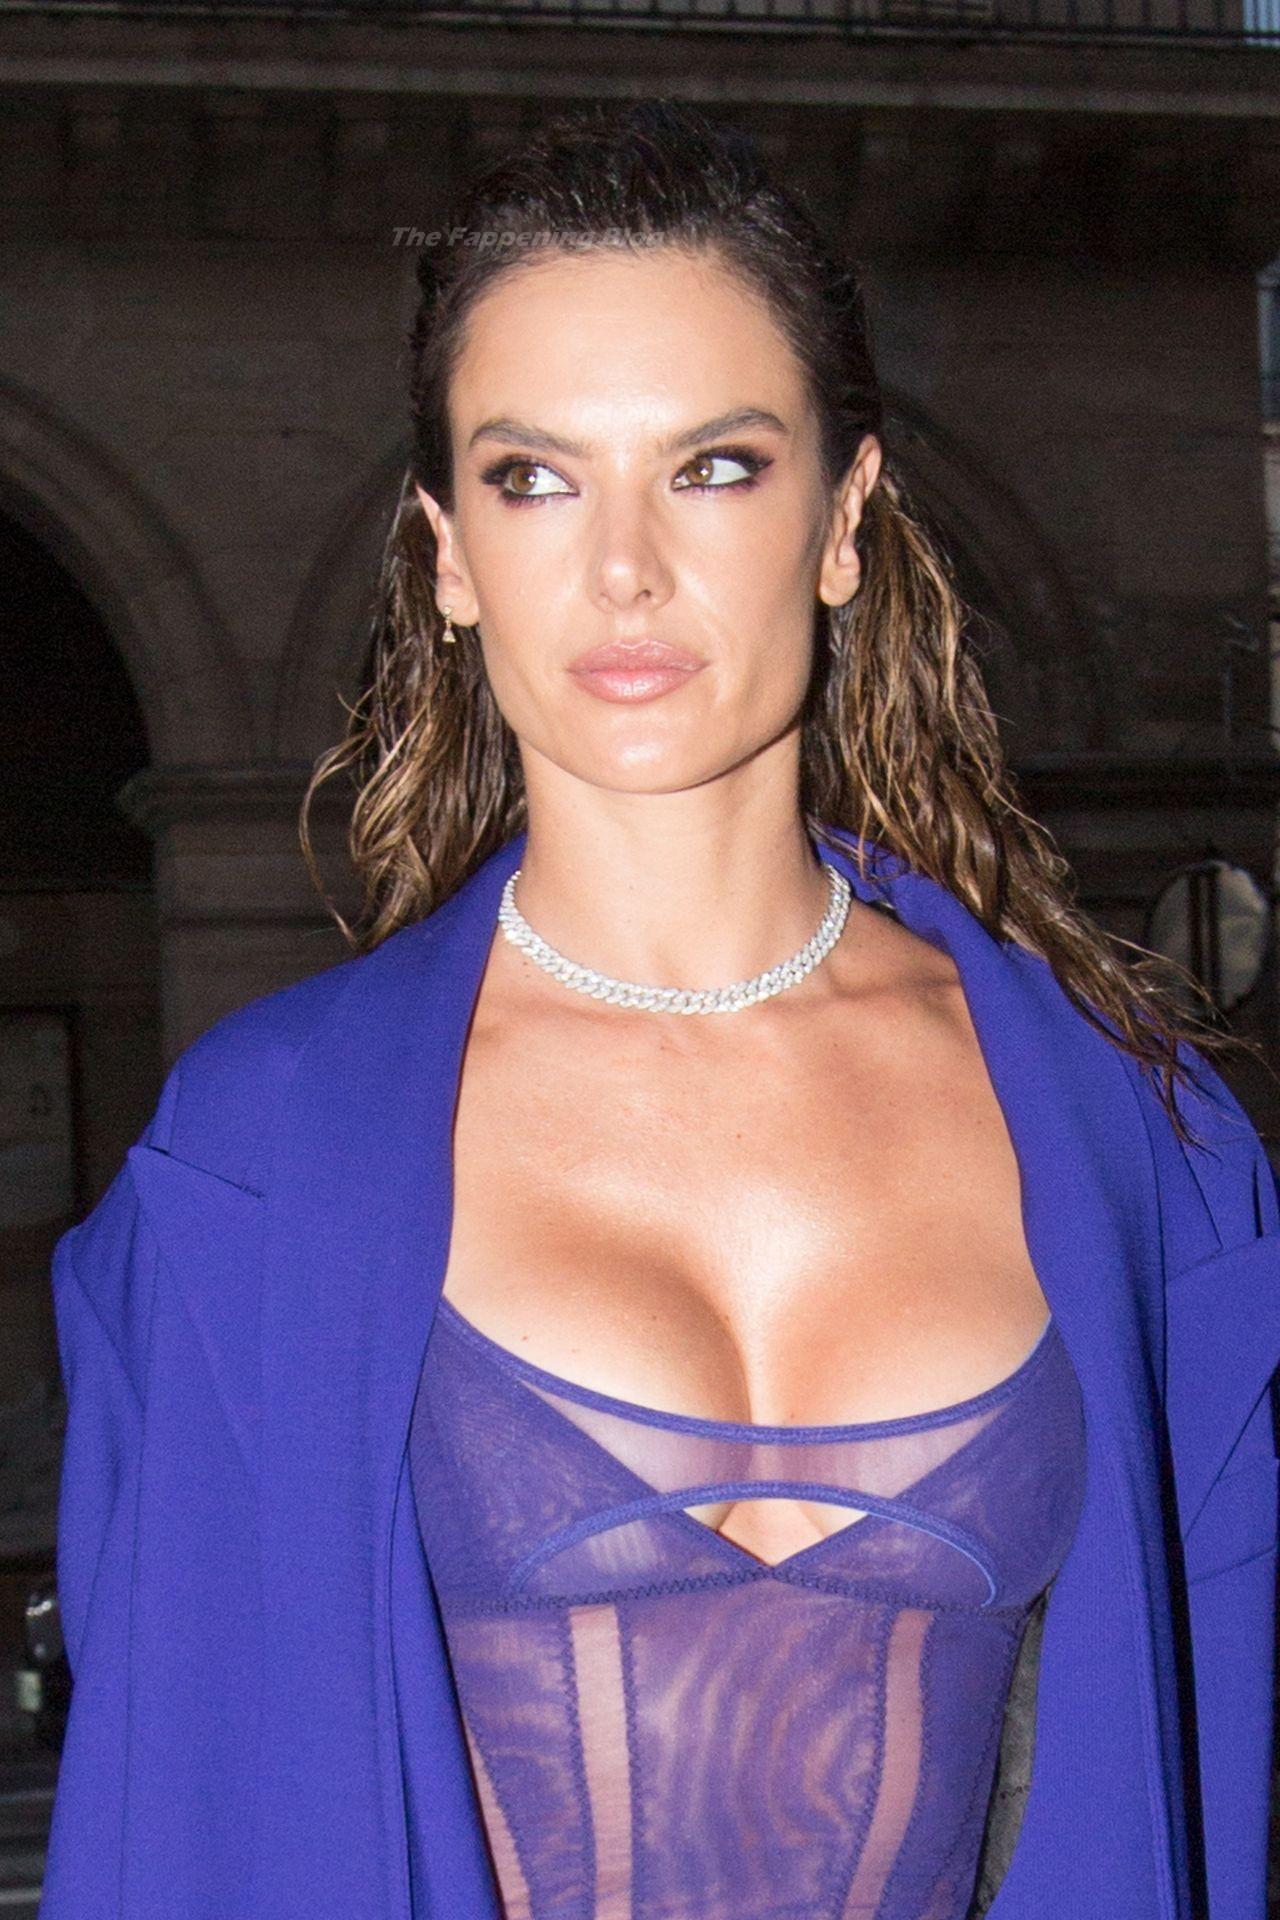 Alessandra-Ambrosio-Sexy-The-Fappening-Blog-7-3.jpg